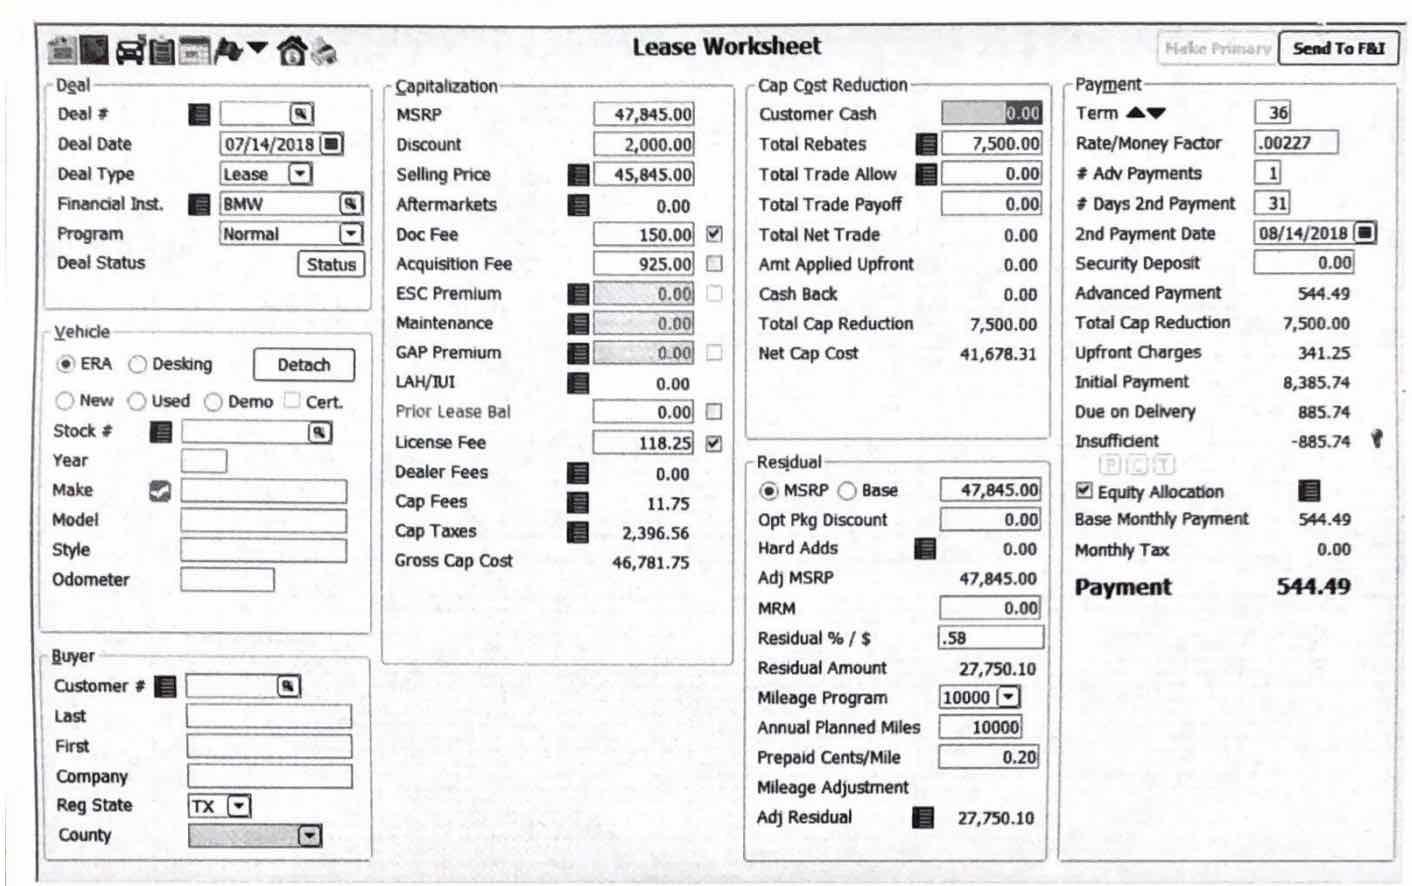 Need help understanding this BMW i3 lease worksheet - Ask